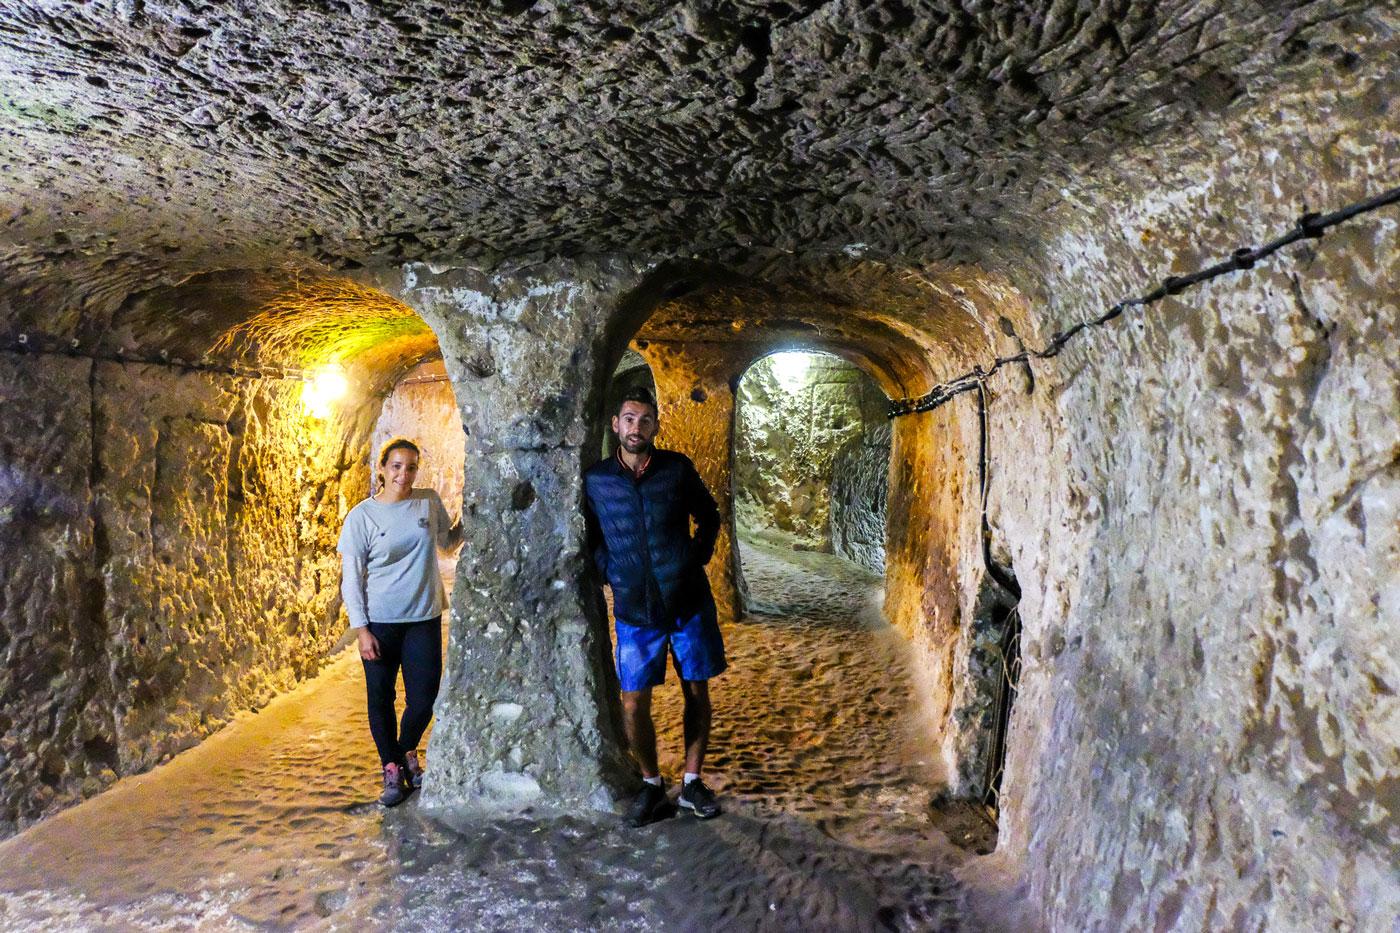 La Turquie à vélo, ville souterraine de Derinkuyu. Cycling Turquey, underground city of Derinkuyu.